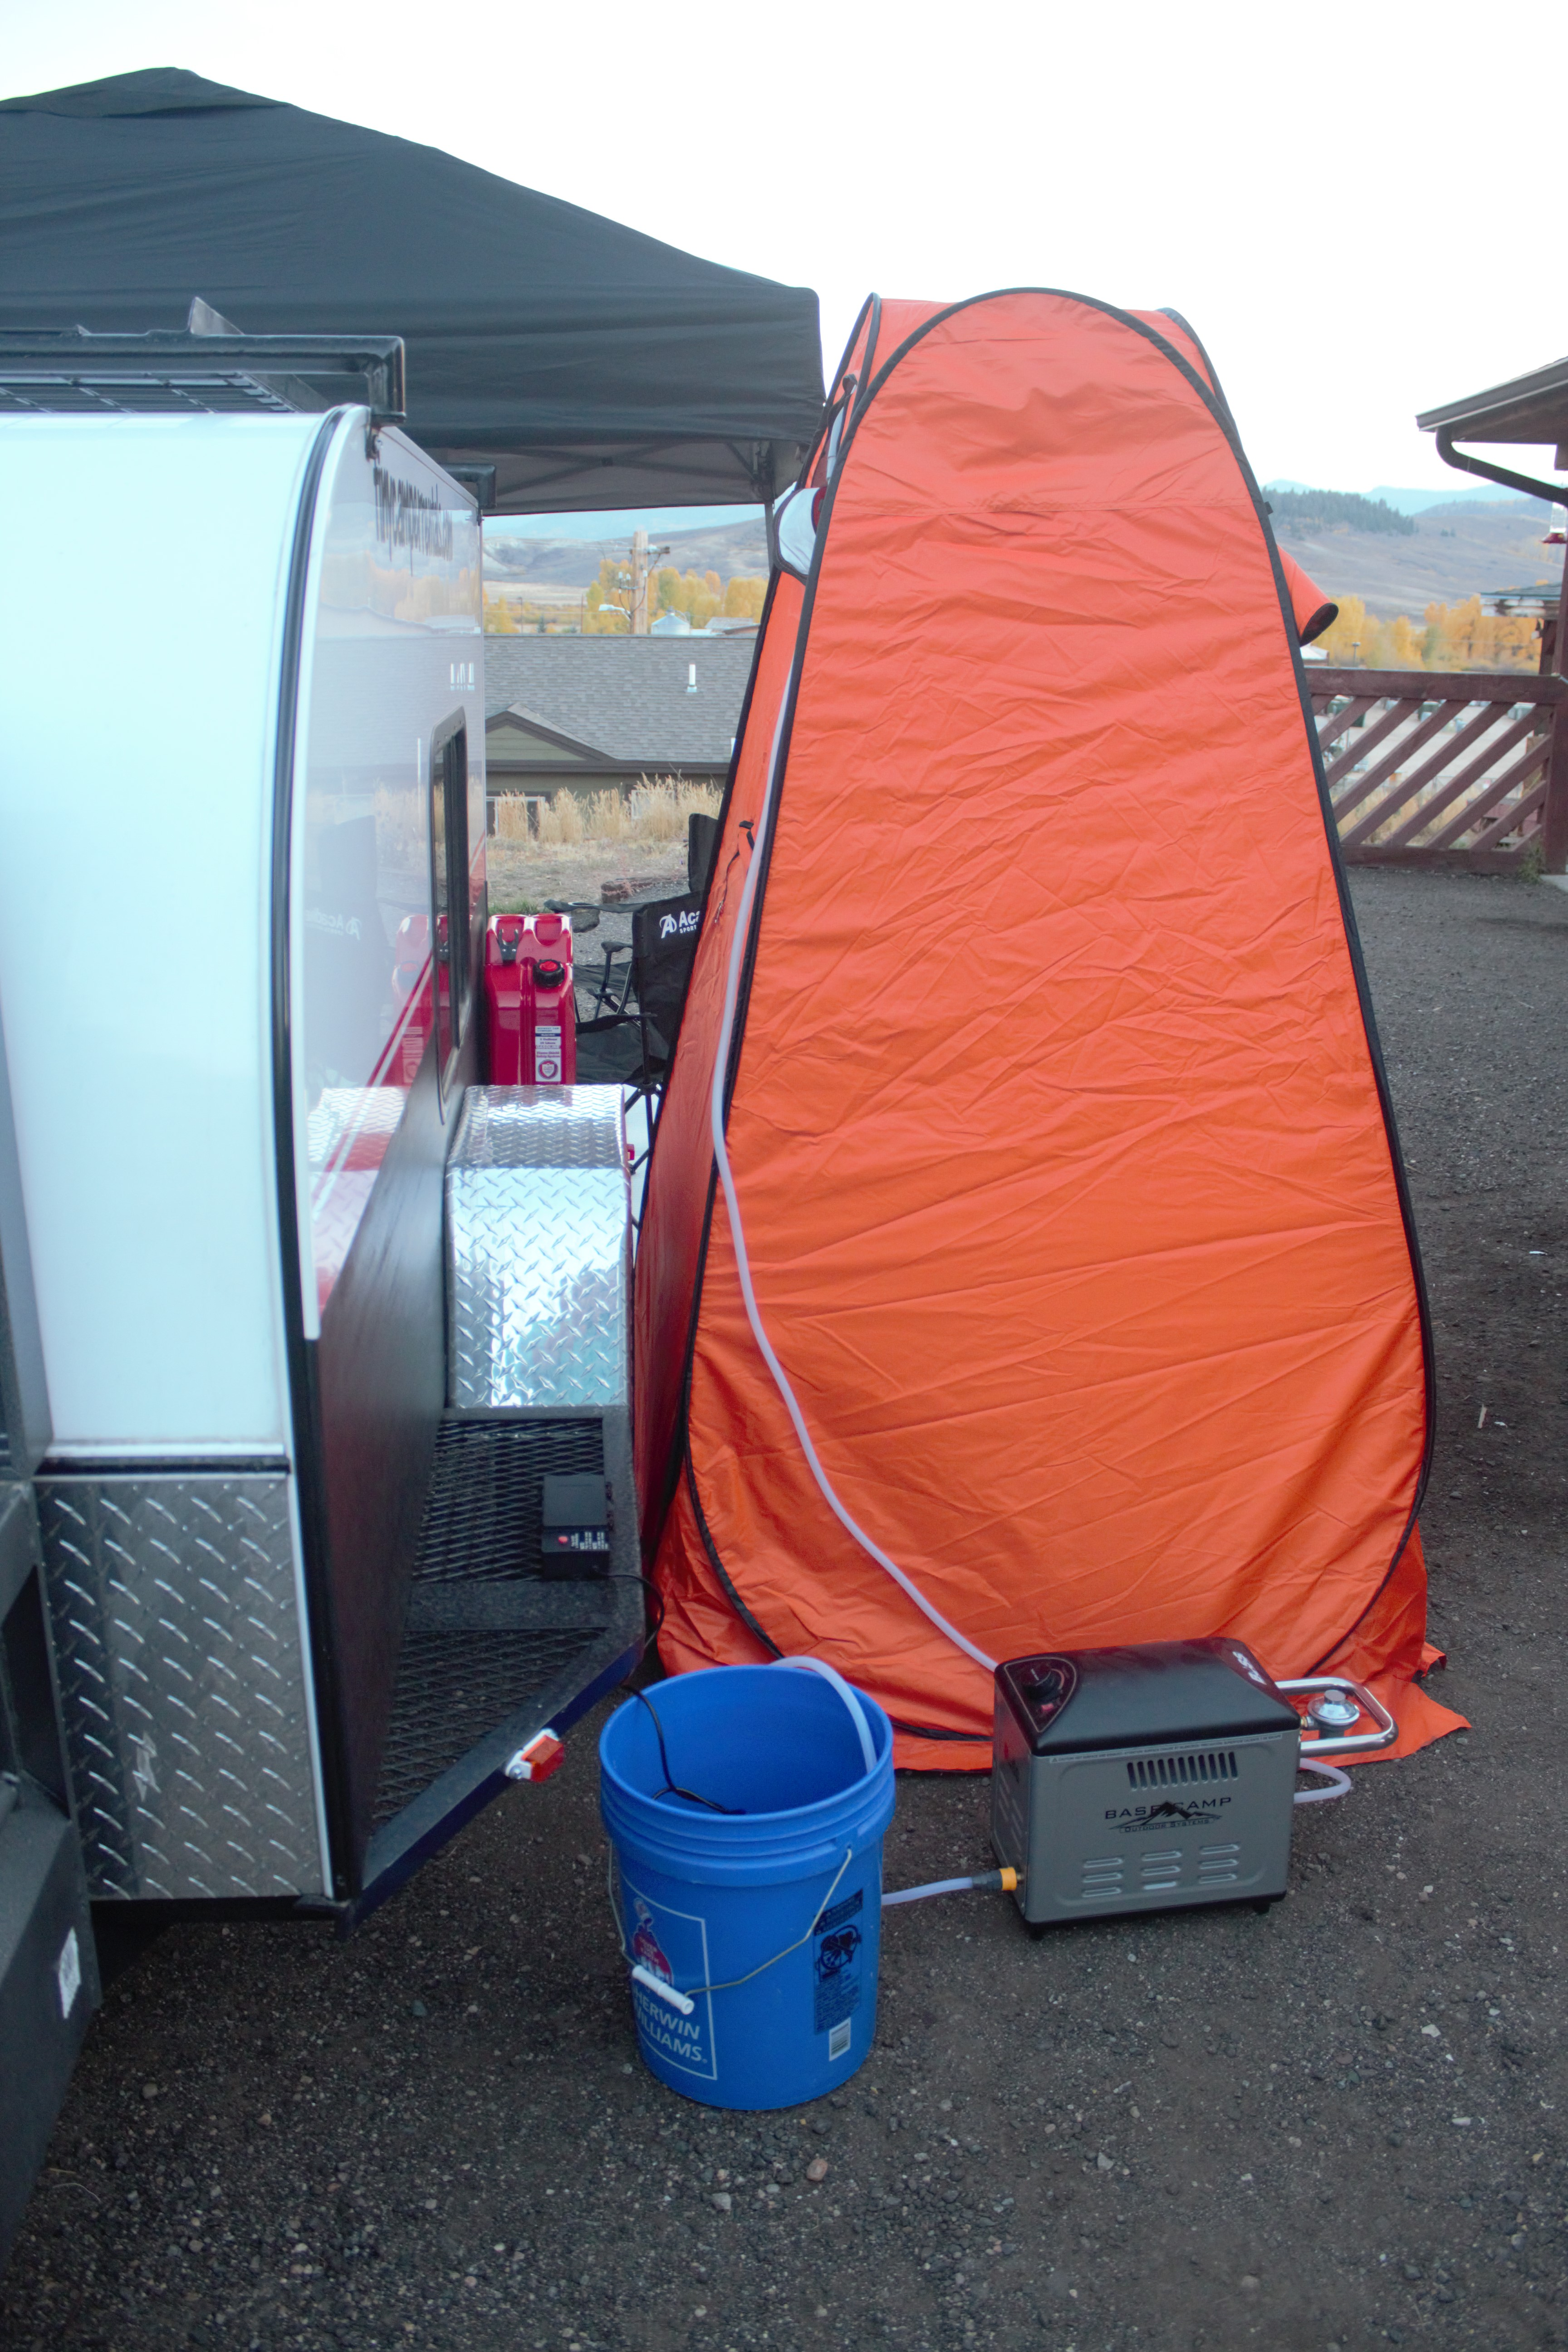 Shower Heater Set-up